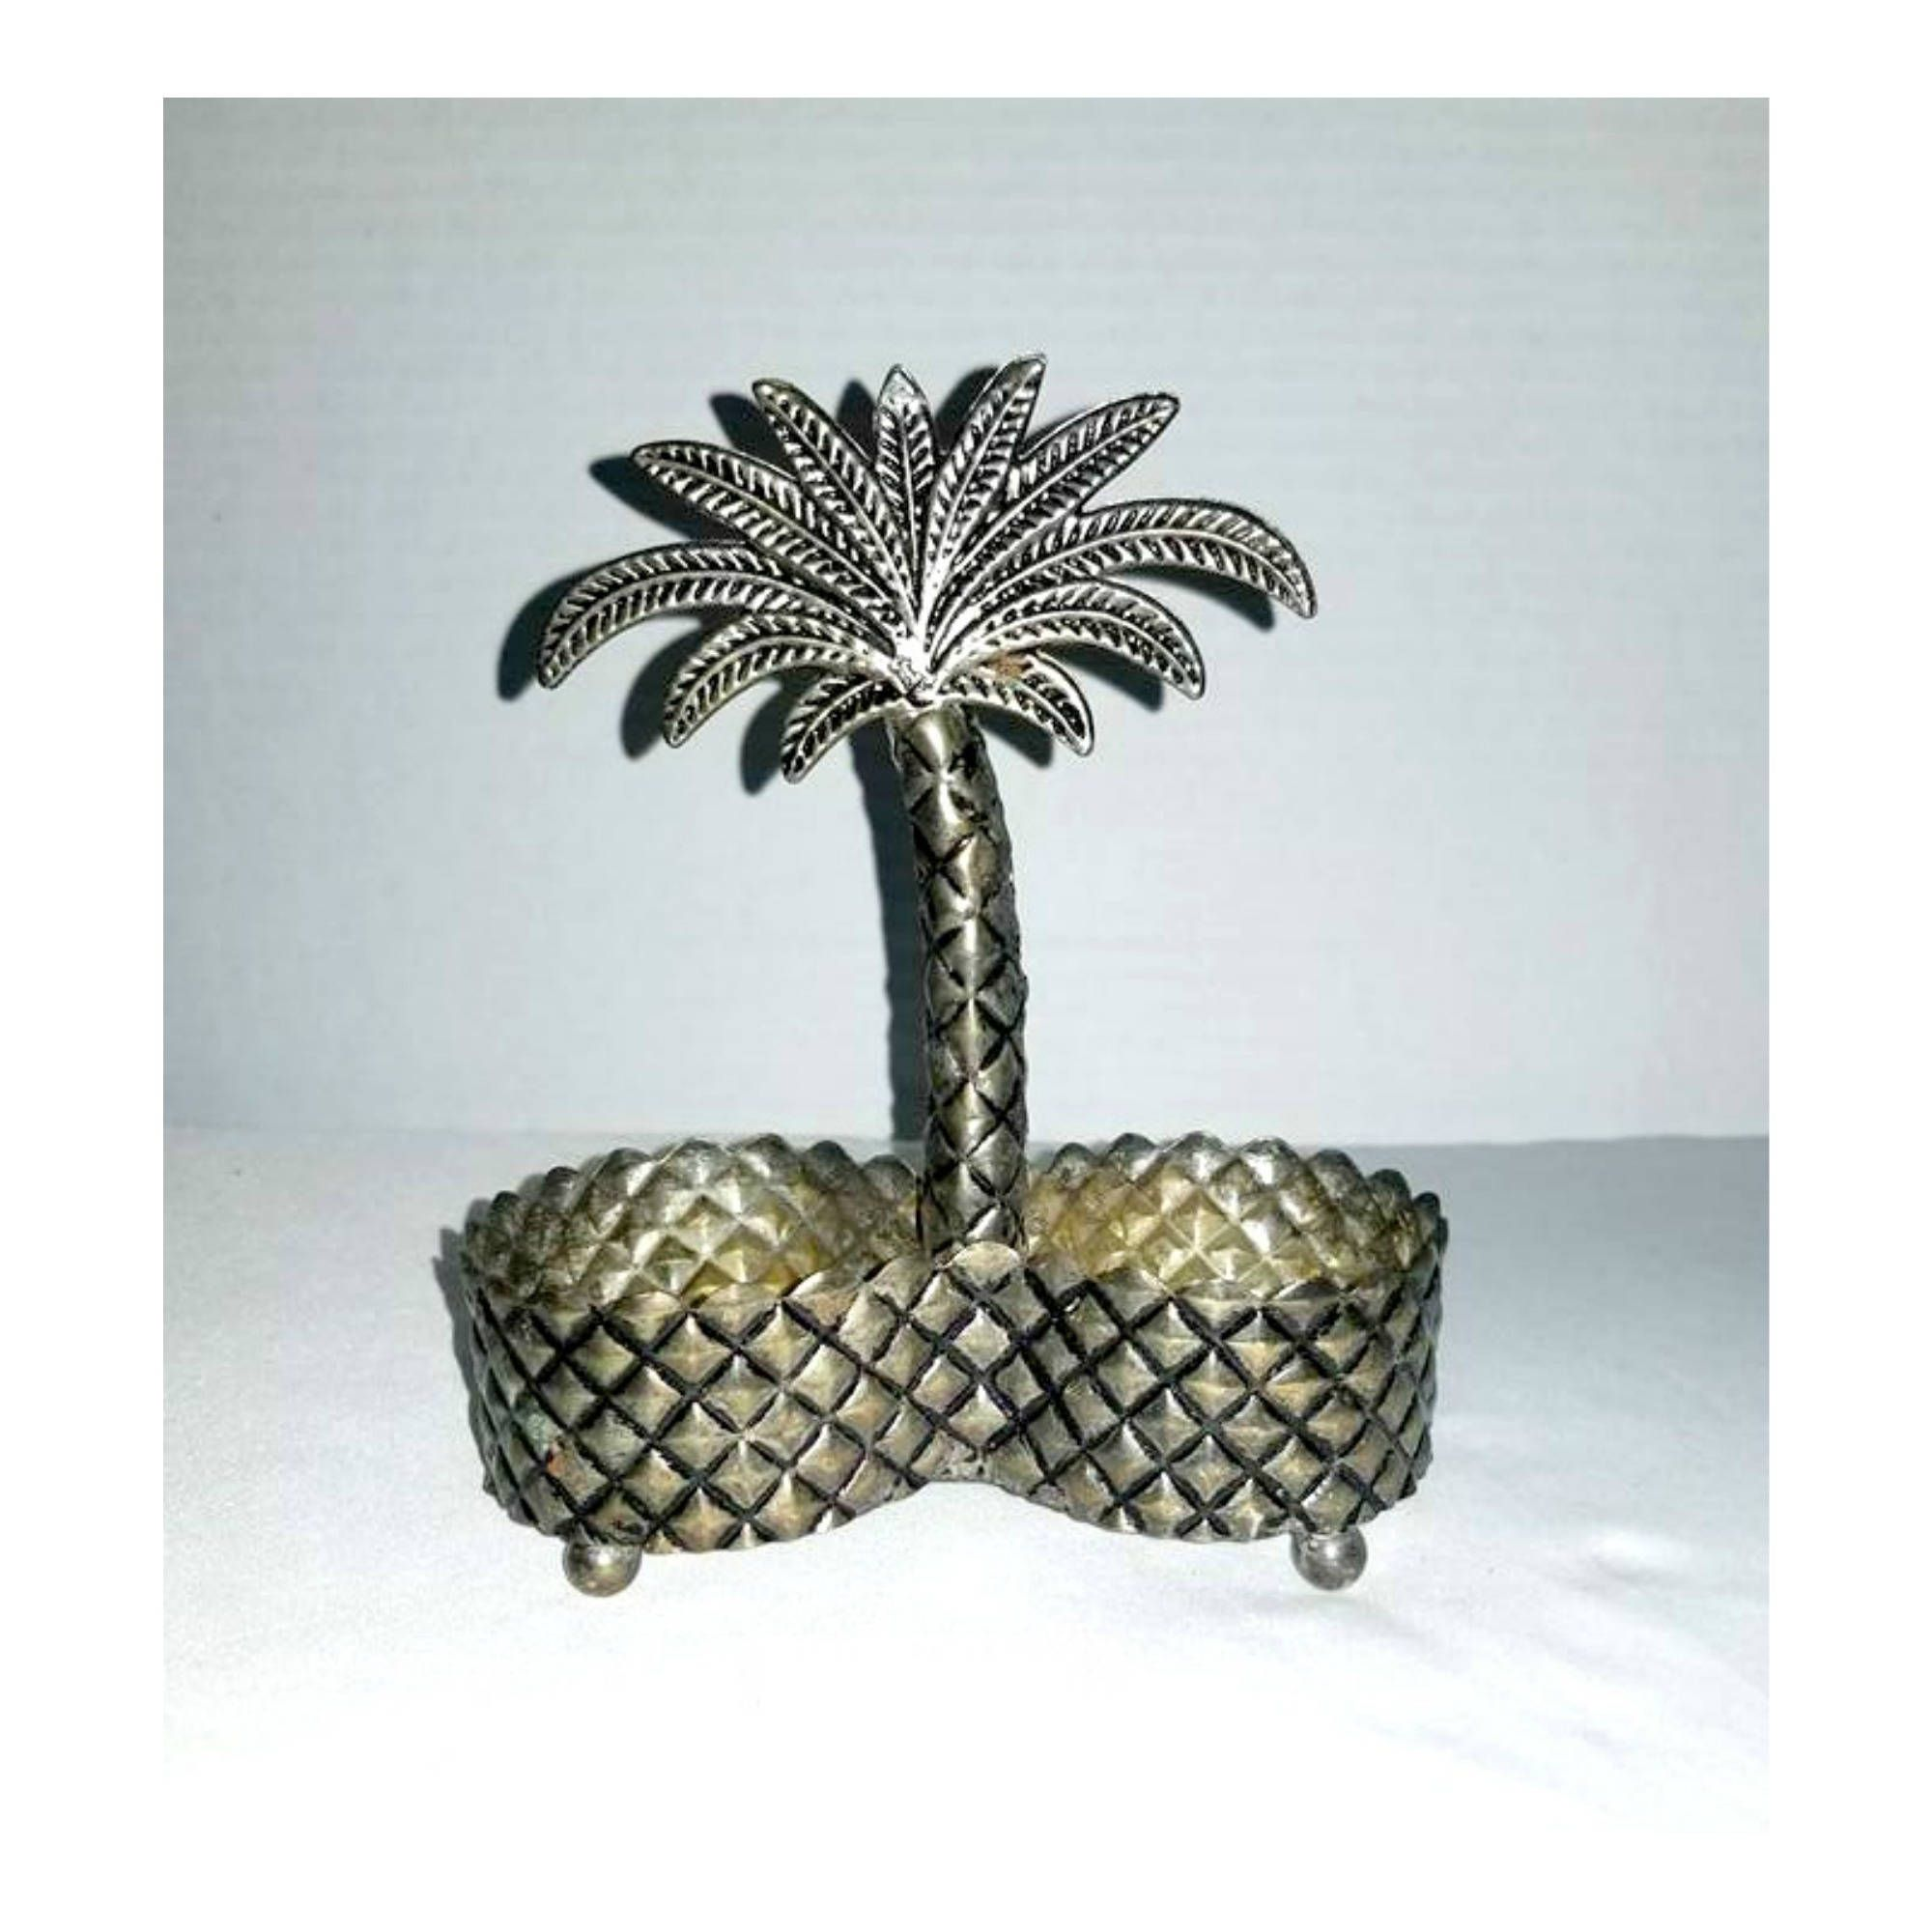 Vintage Pewter Shaker Holder Palm Tree Shaker Holder Palm Tree